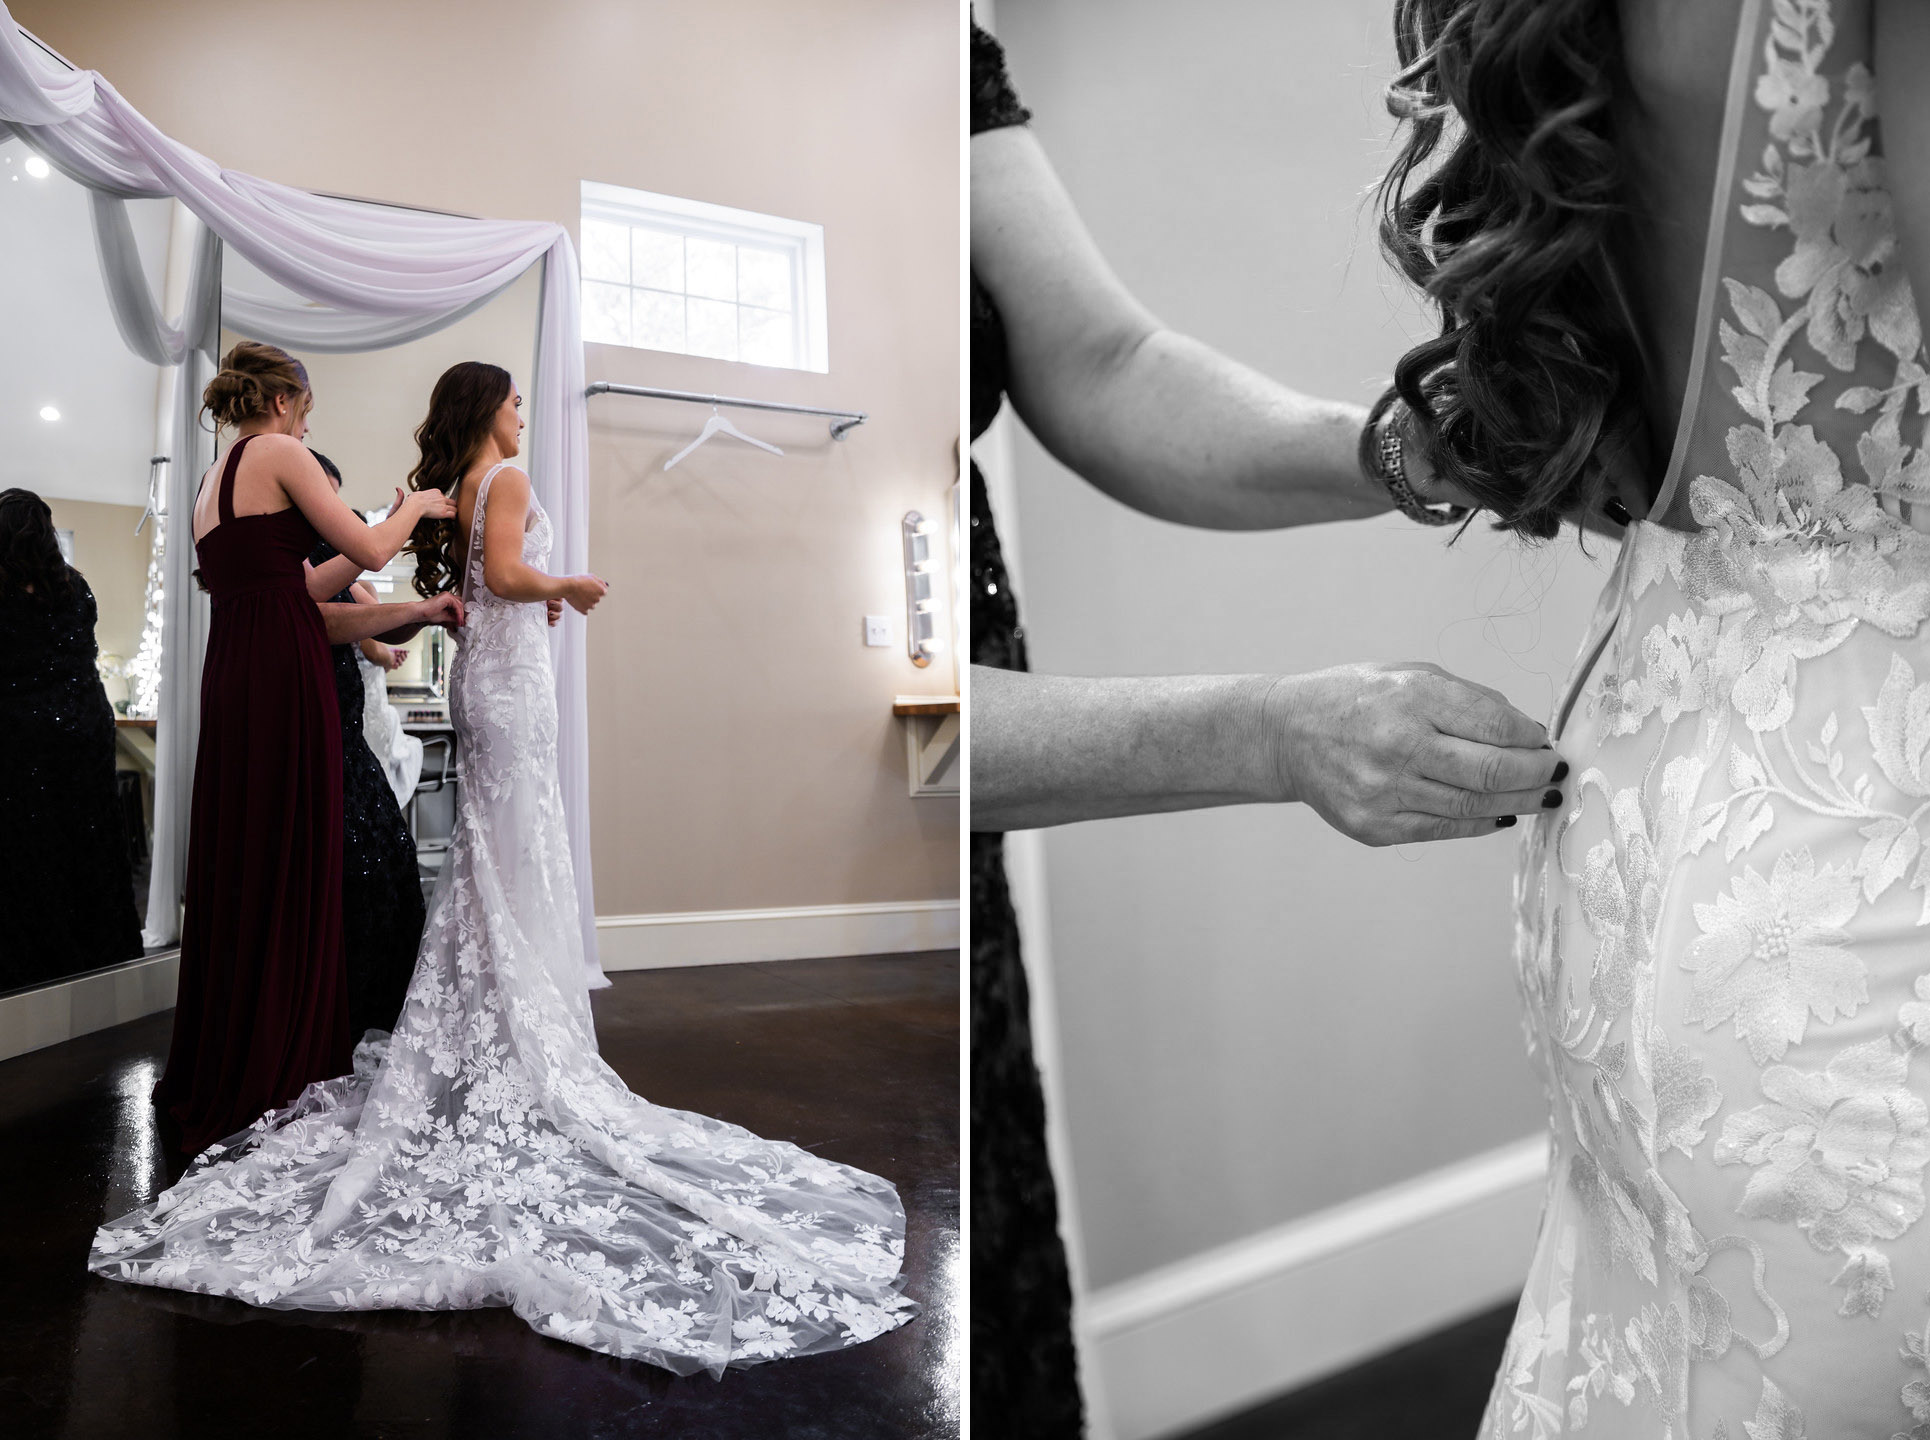 adam-szarmack-bowing-oaks-wedding-photographer-jacksonville-36.jpg